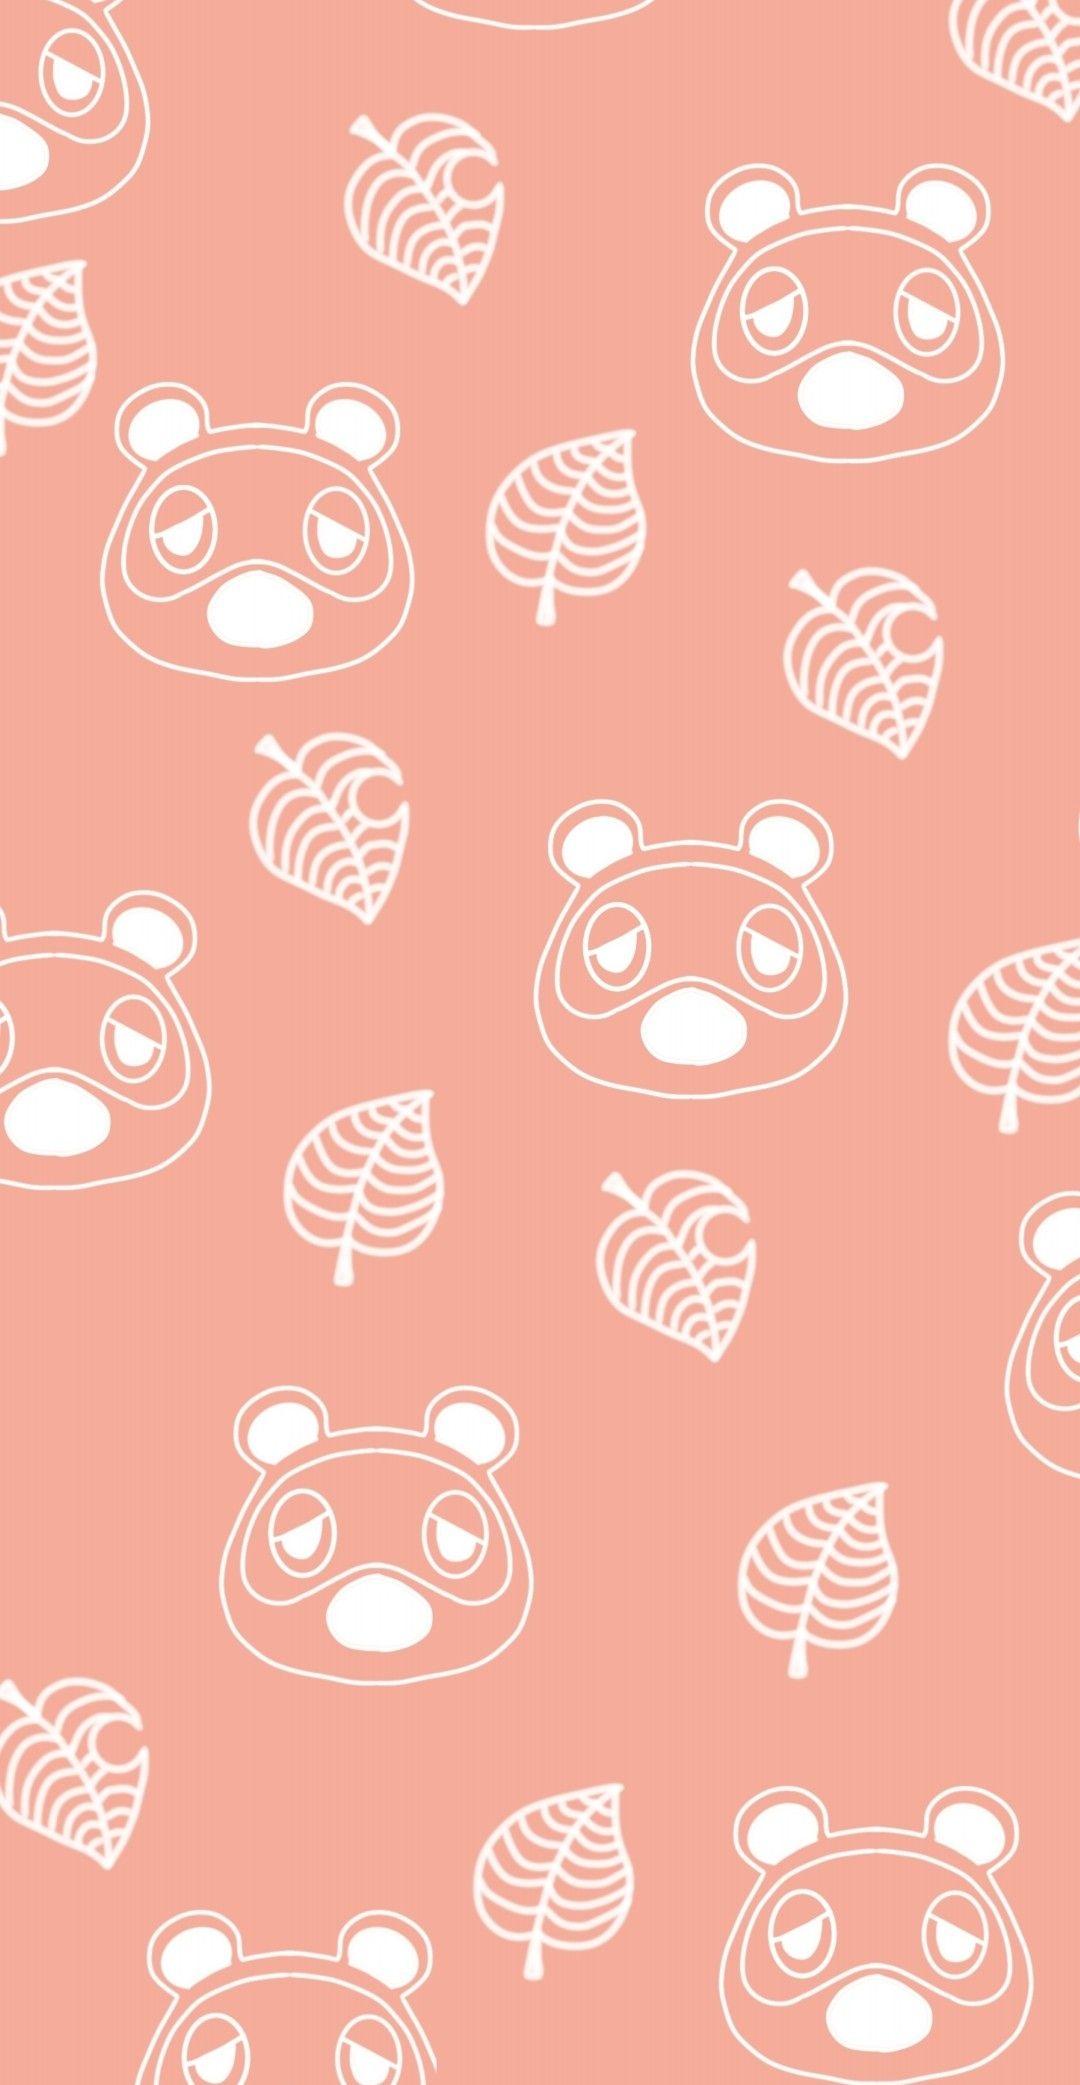 Animal Crossing New Horizons Tom Nook Wallpaper Animal Crossing Nook Wallpaper Animal Crossing Wallpaper